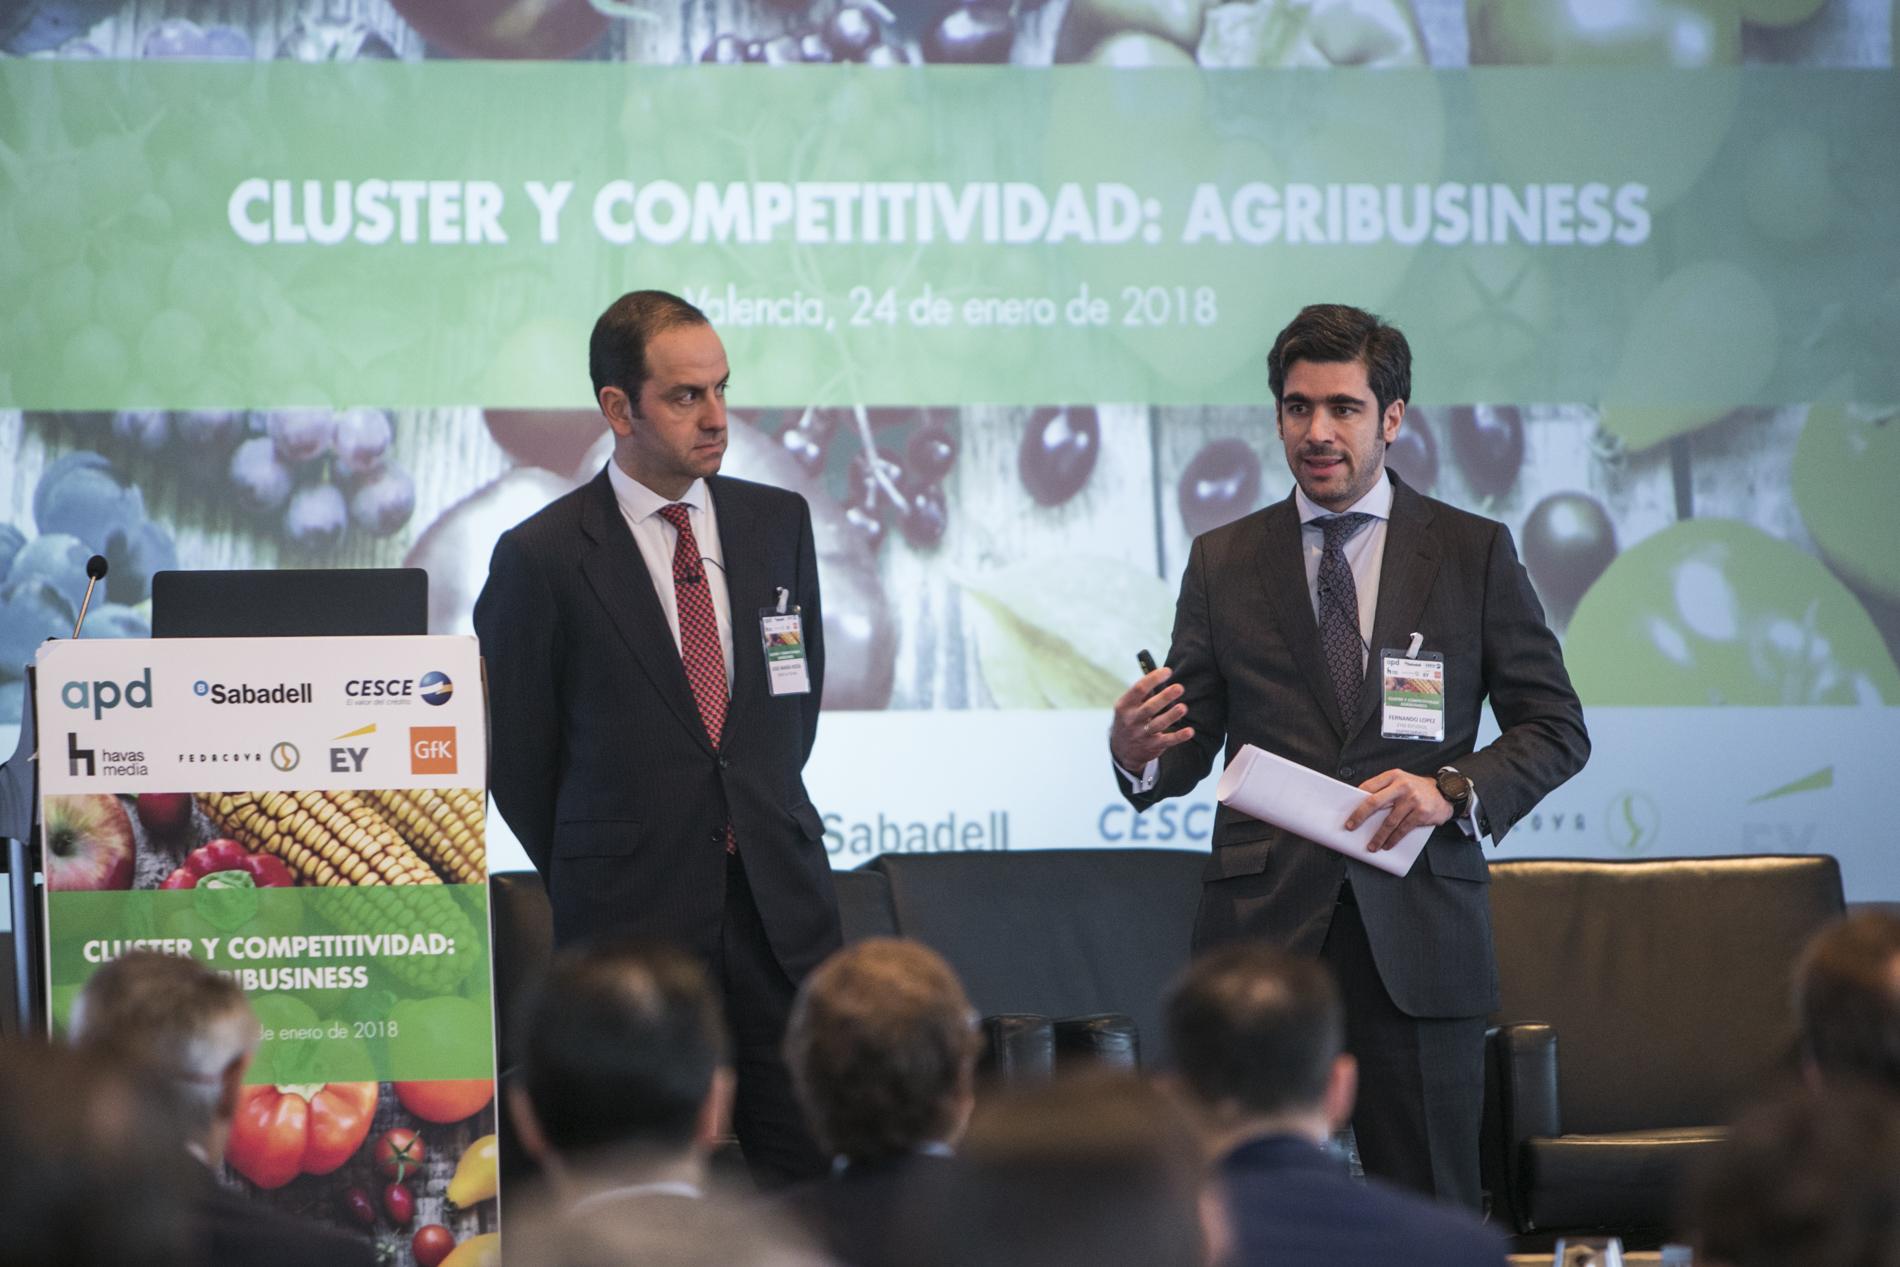 Jornada Cluster y Competitividad - Agribusiness